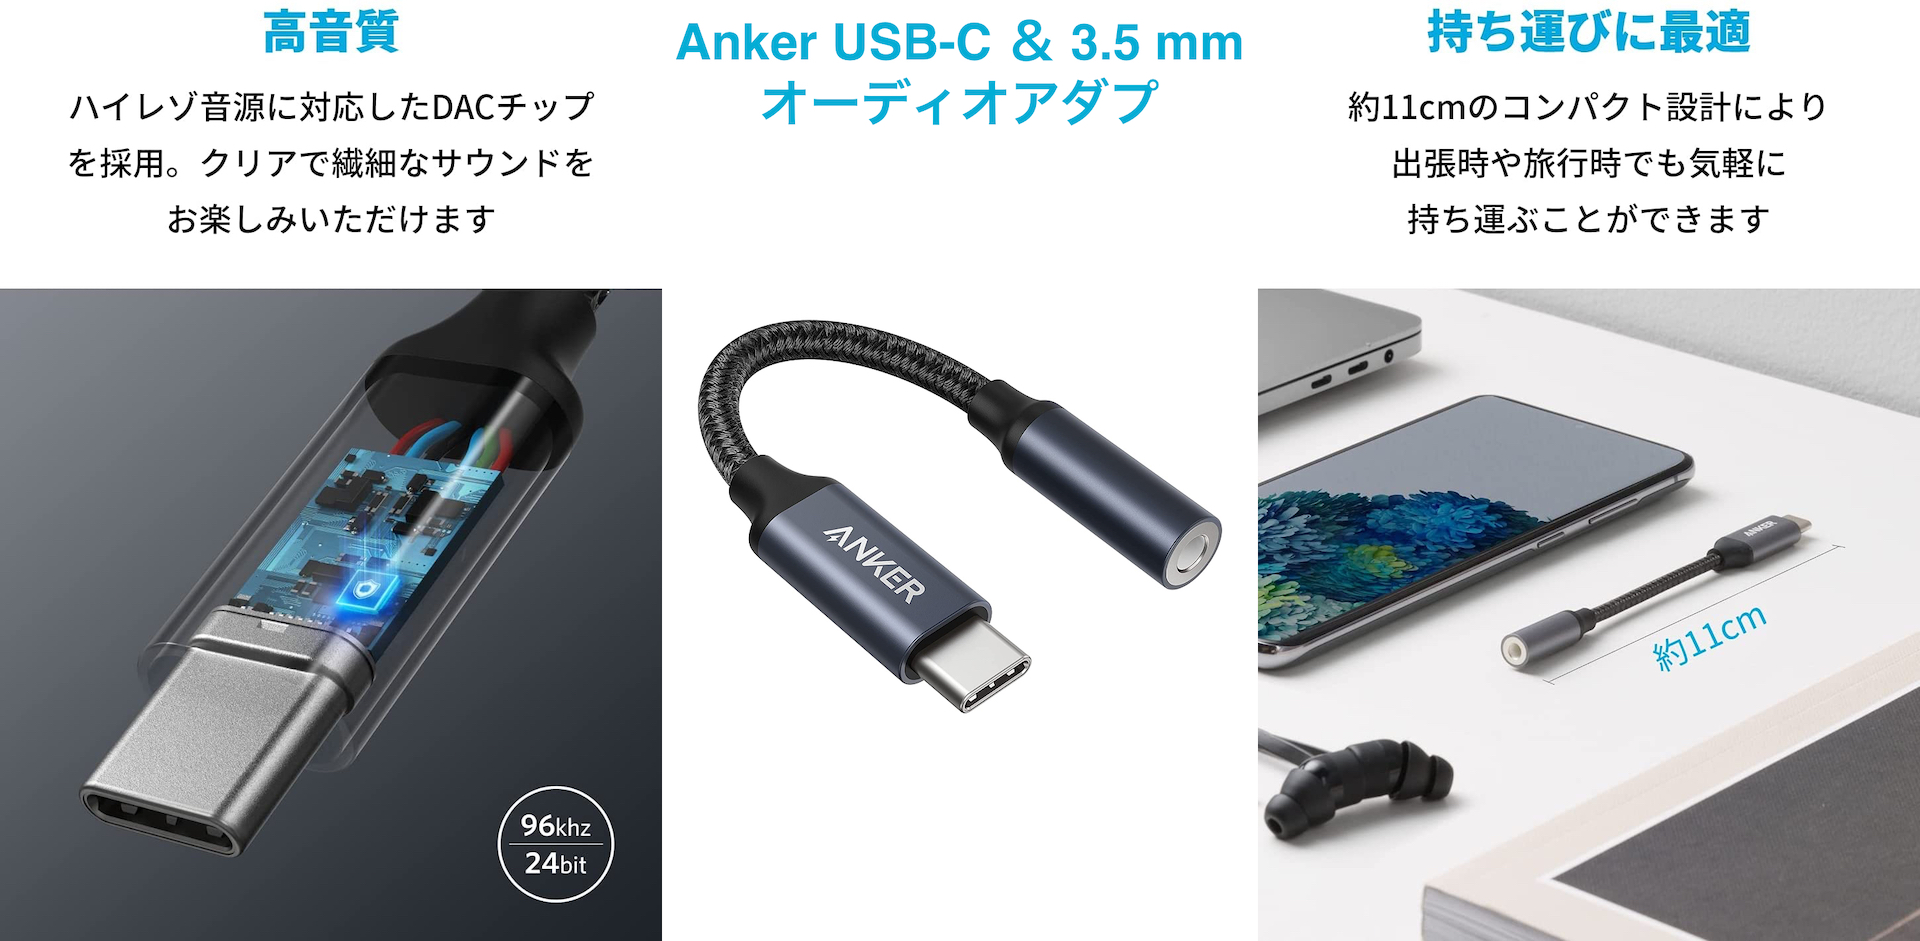 Anker USB-C & 3.5 mm オーディオアダプ